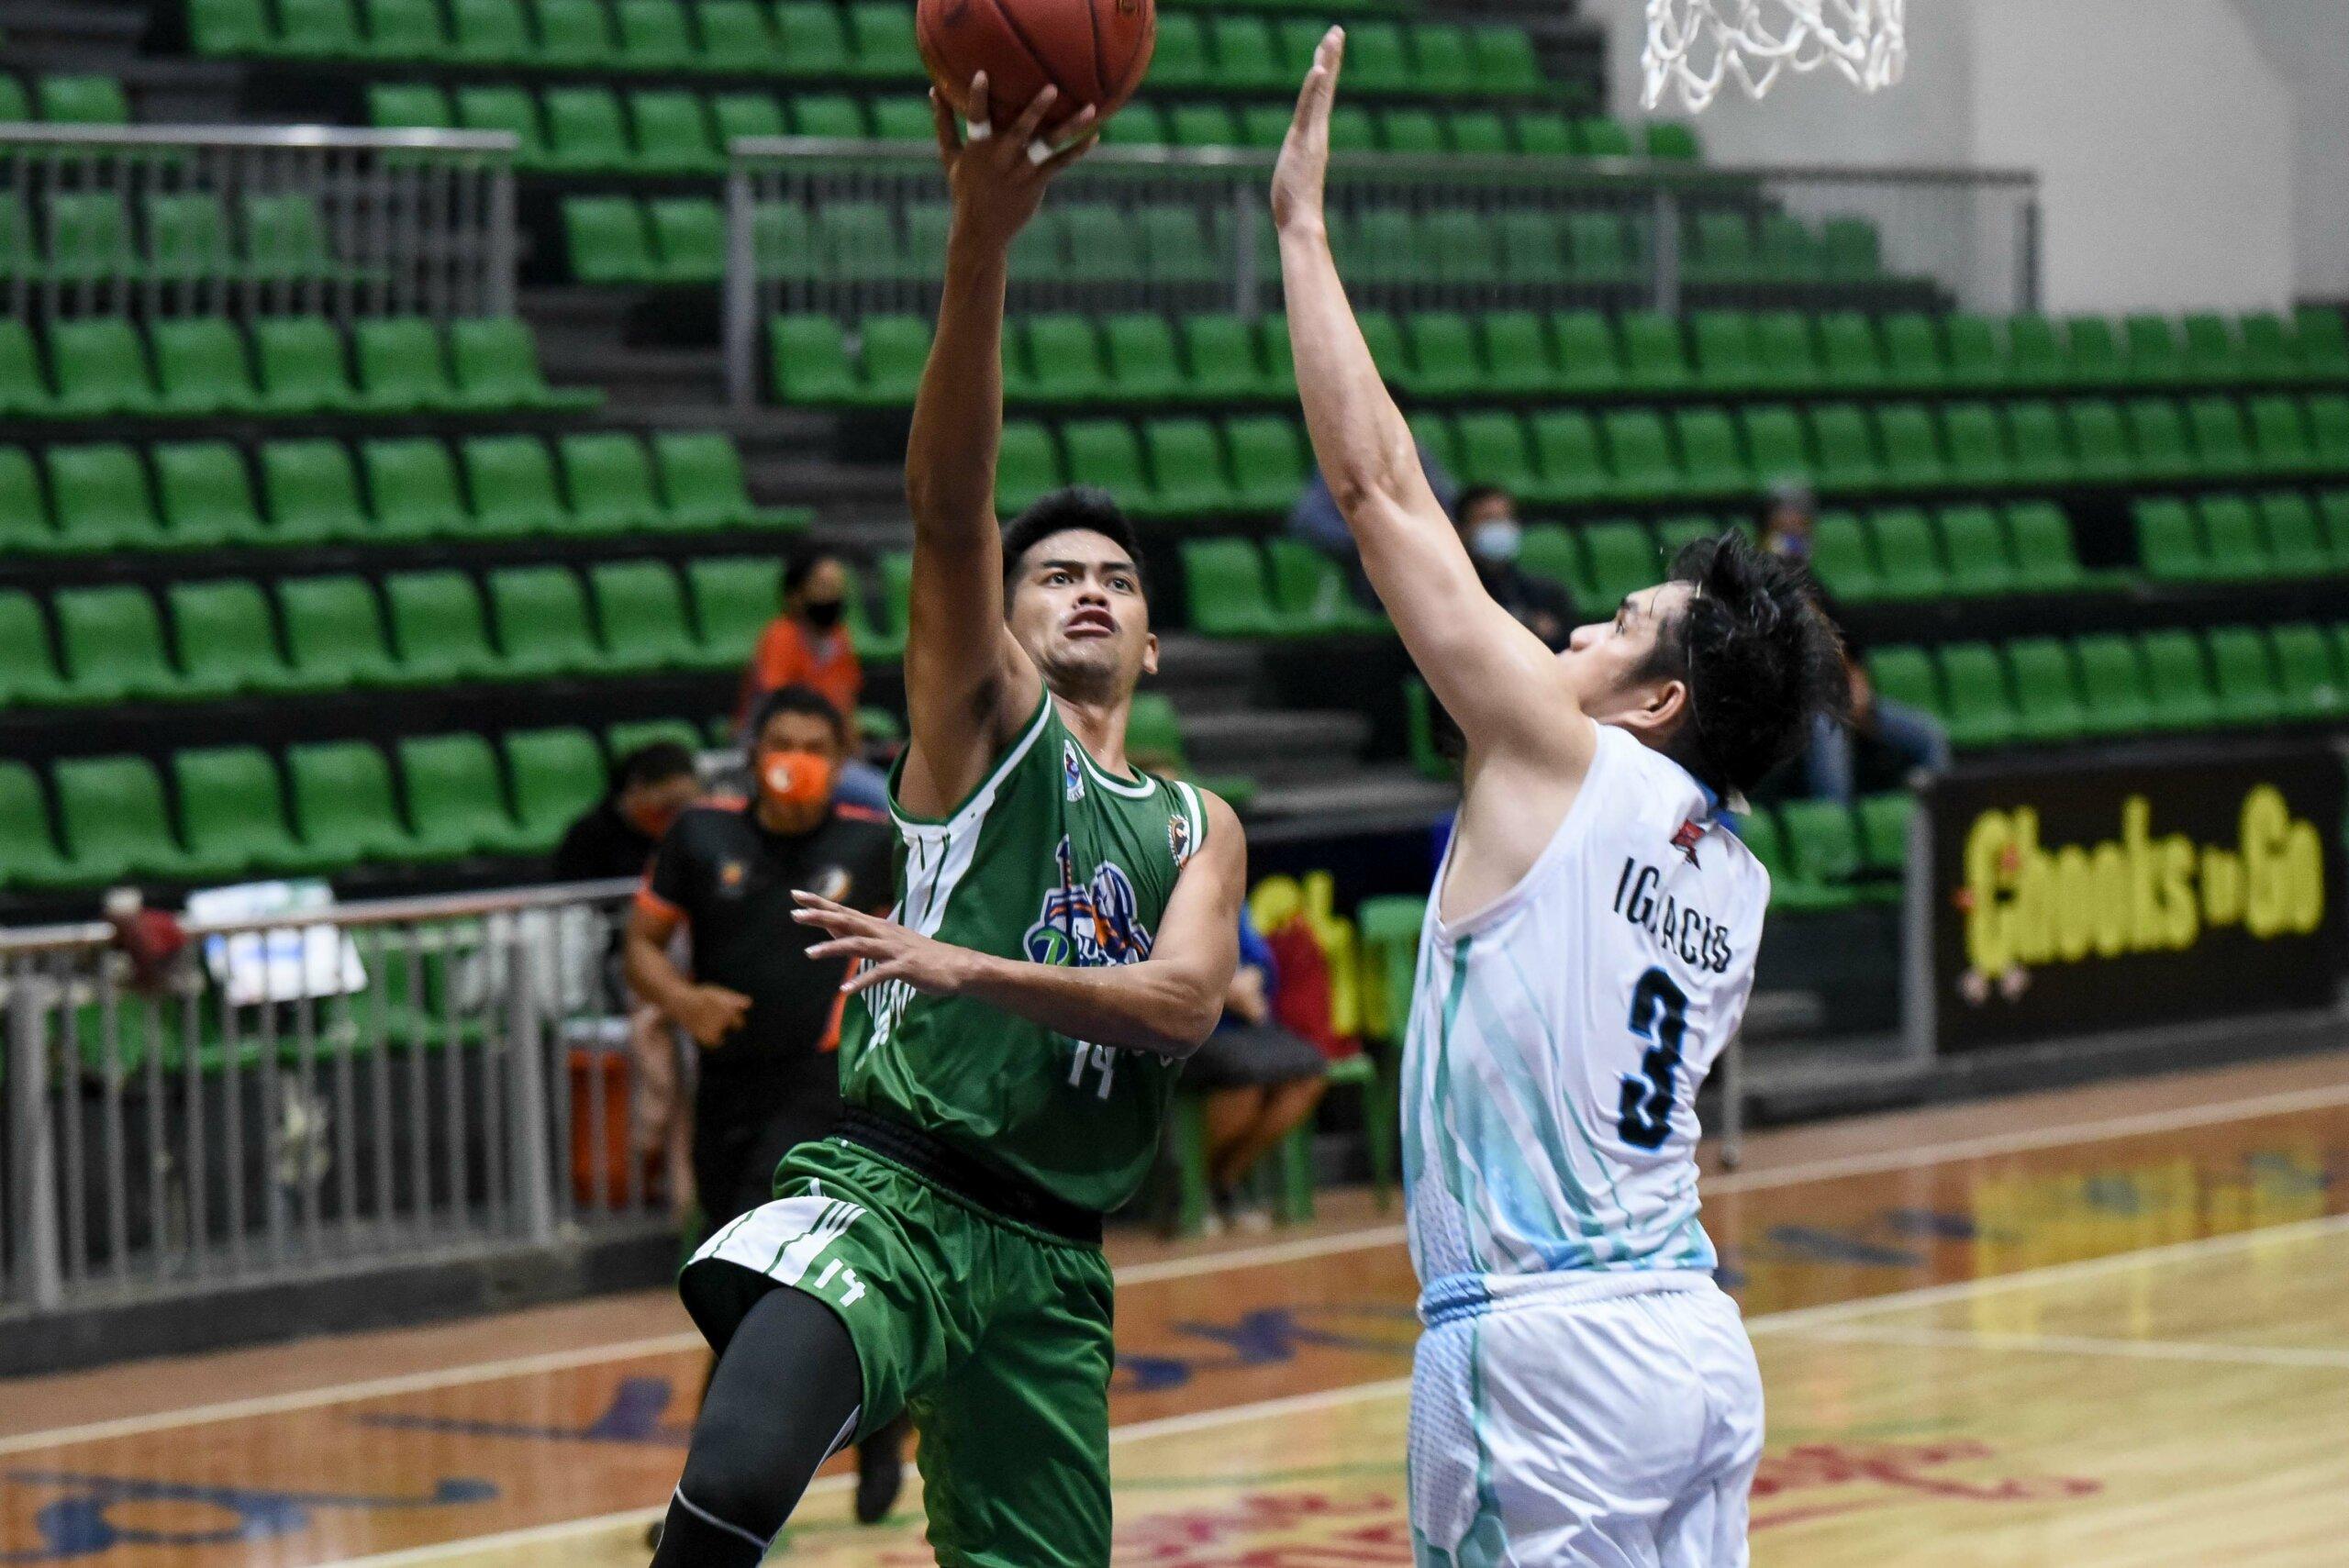 2021-NBL-Season-Quezon-def-Zamboanga-Alex-Ramos-scaled Bulacan DF cruises to solo lead as Quezon routs Zamboanga in NBL debut Basketball NBL News  - philippine sports news